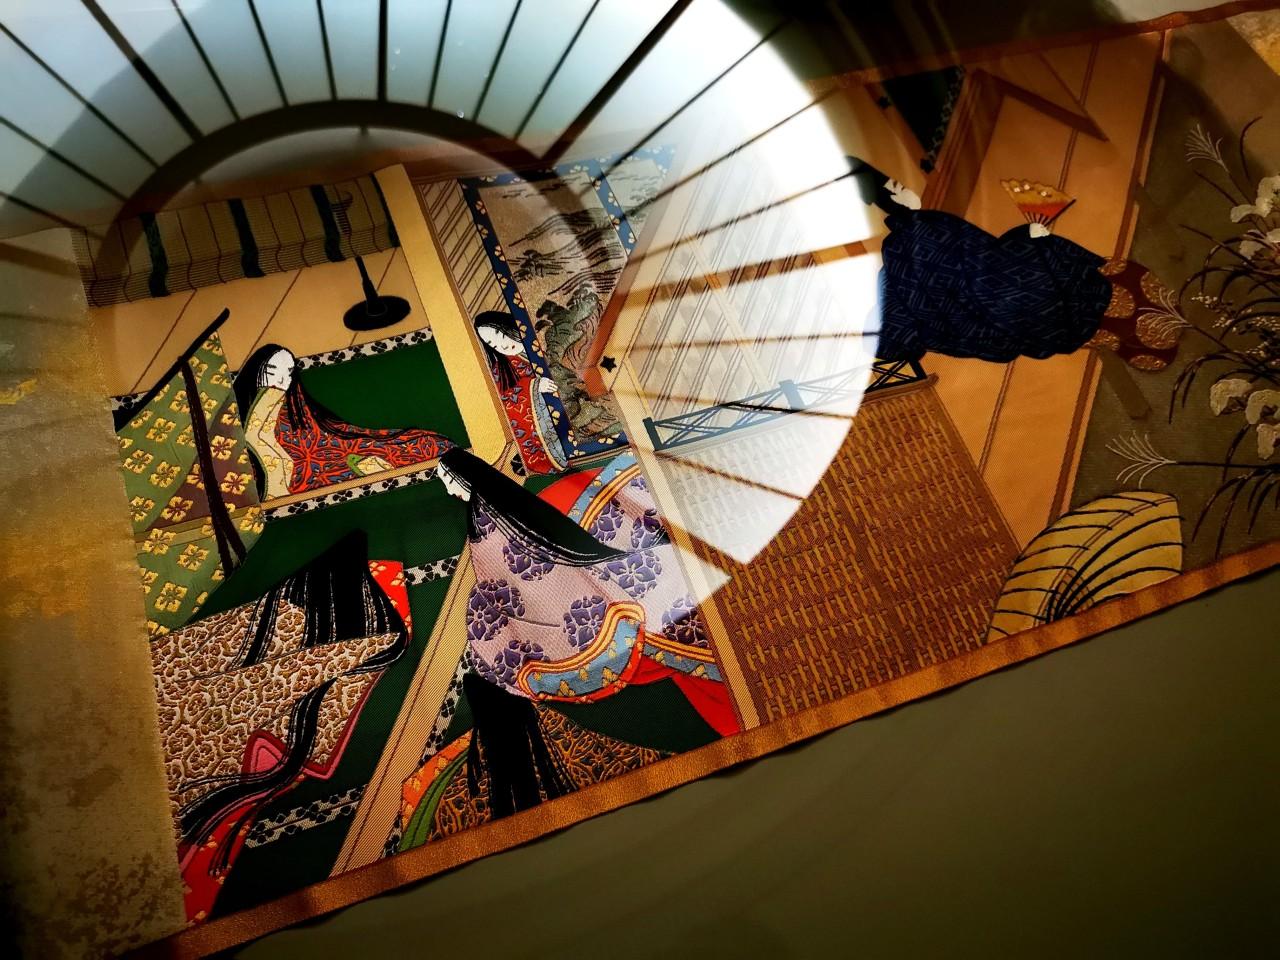 Jardins d'Asie au MuséeGuimet